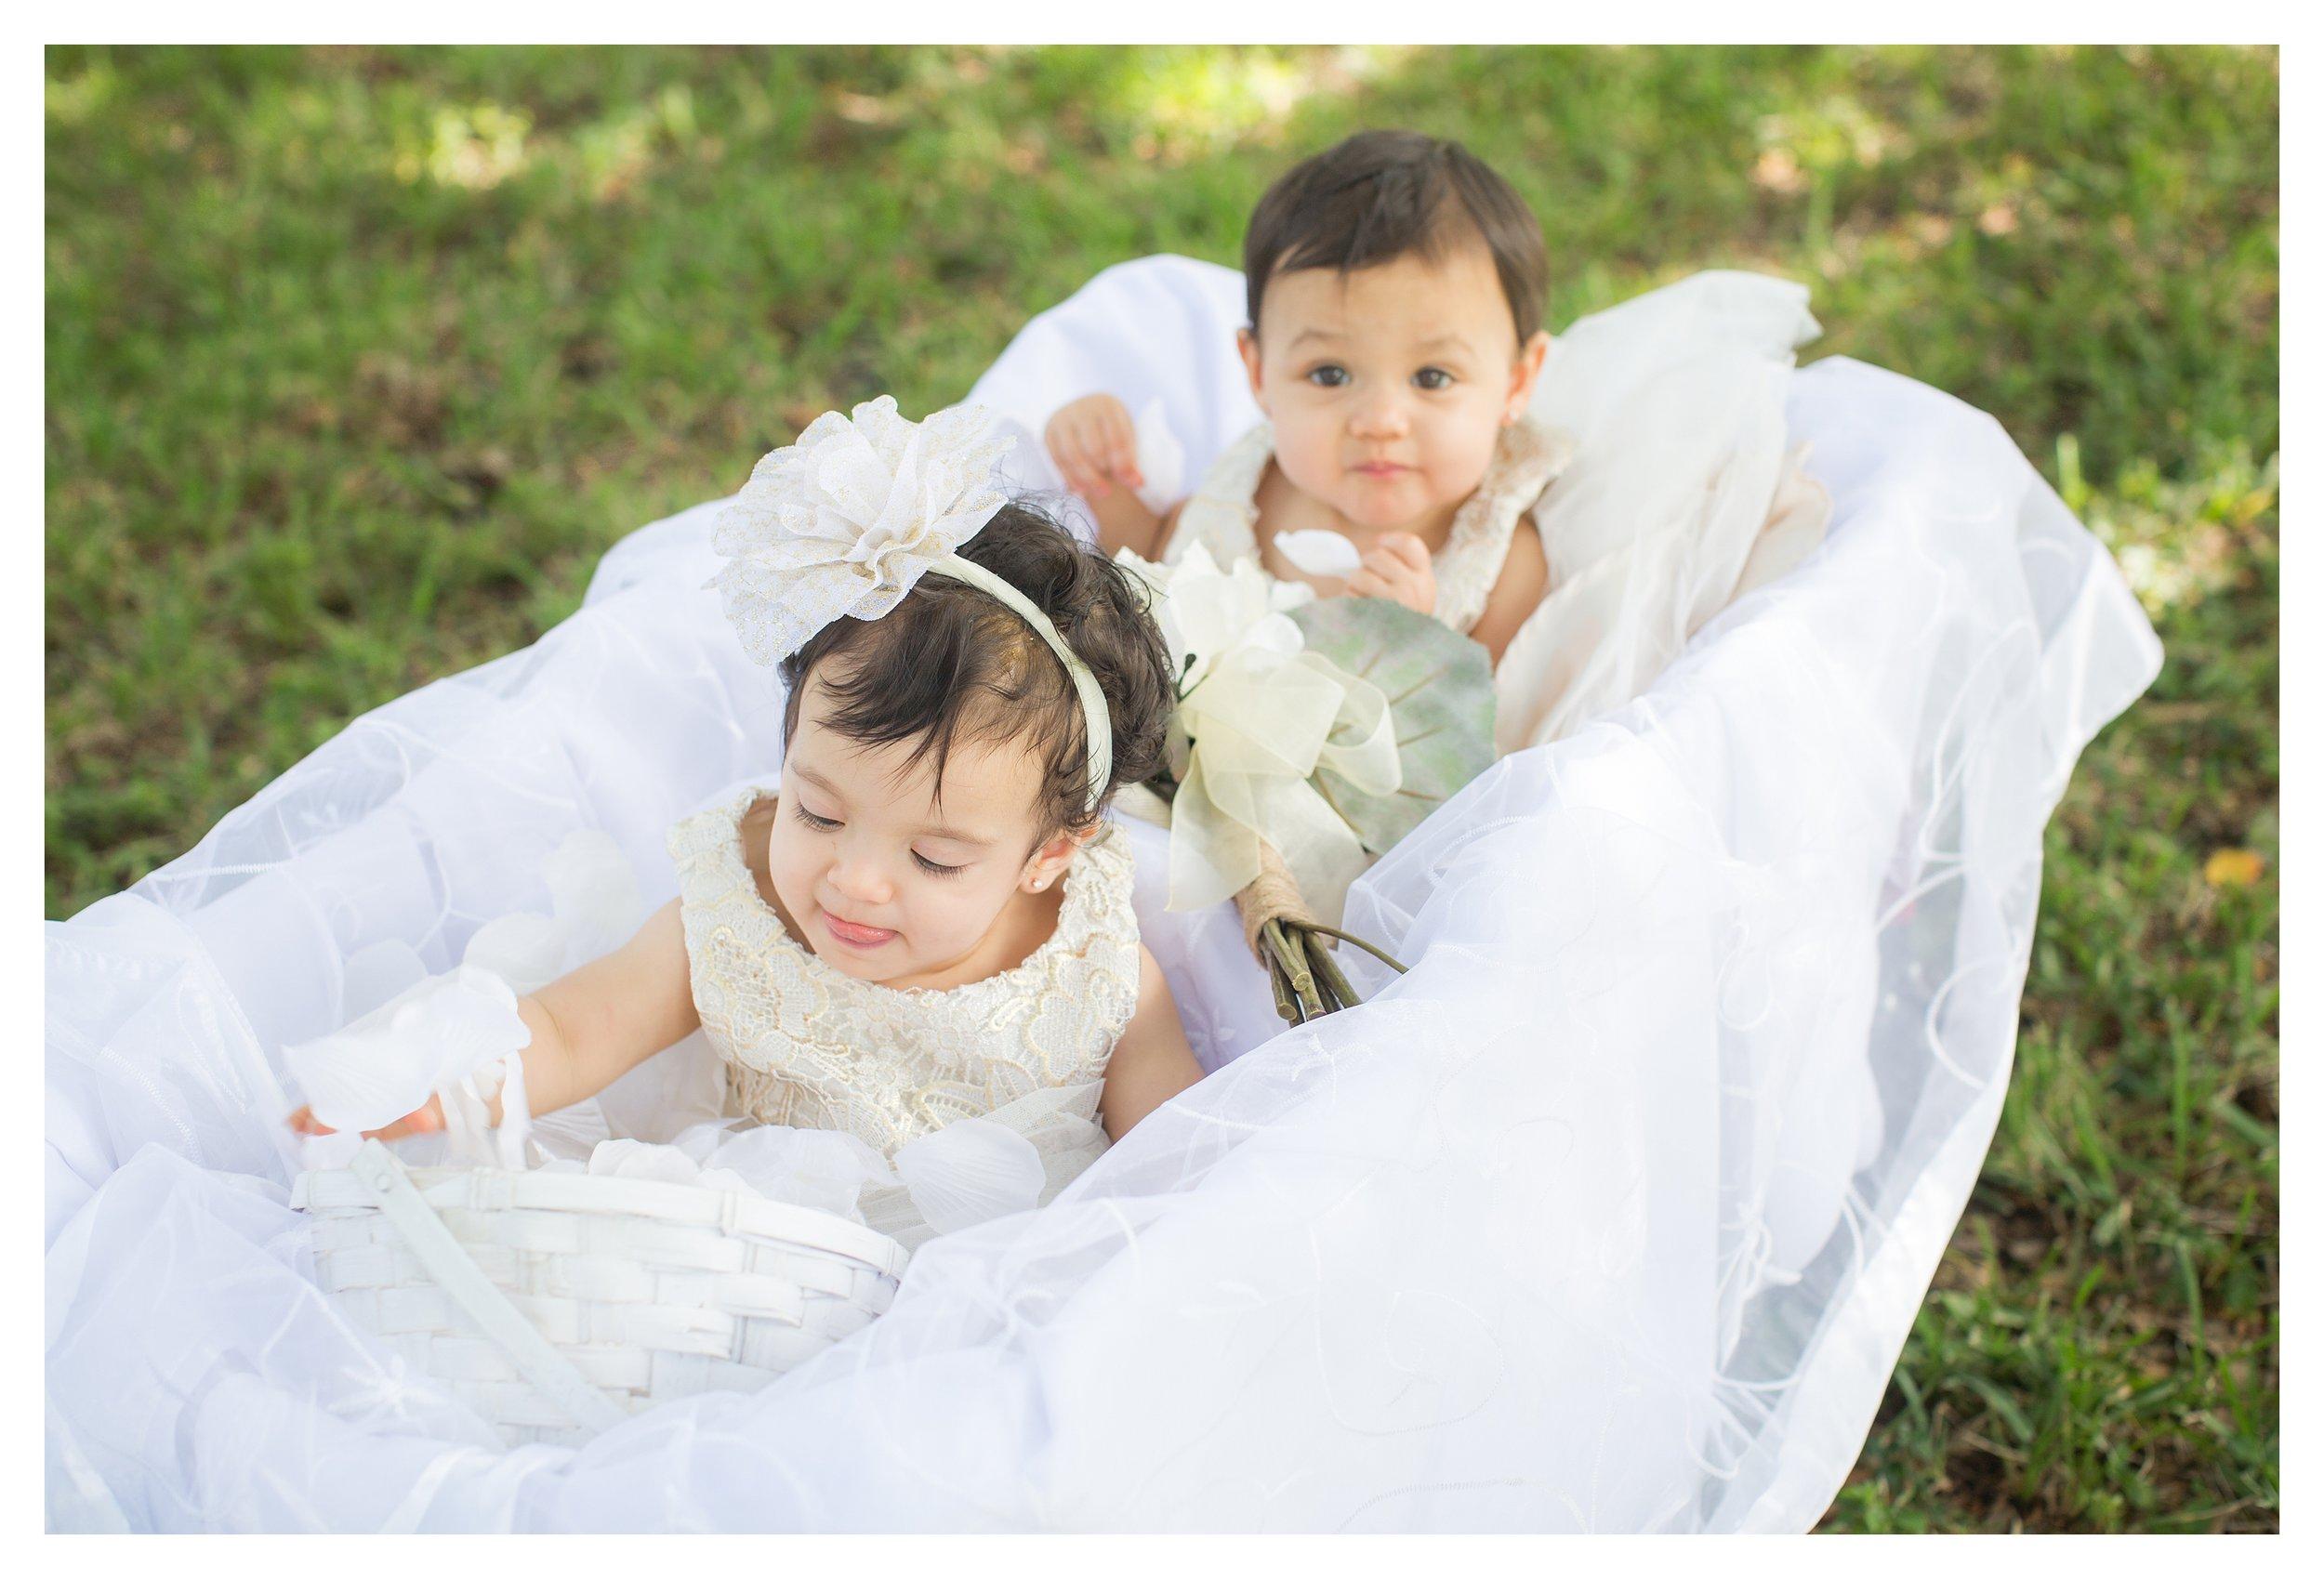 111117_Jenna and Berto's Vow Renewal_Blog_045.JPG